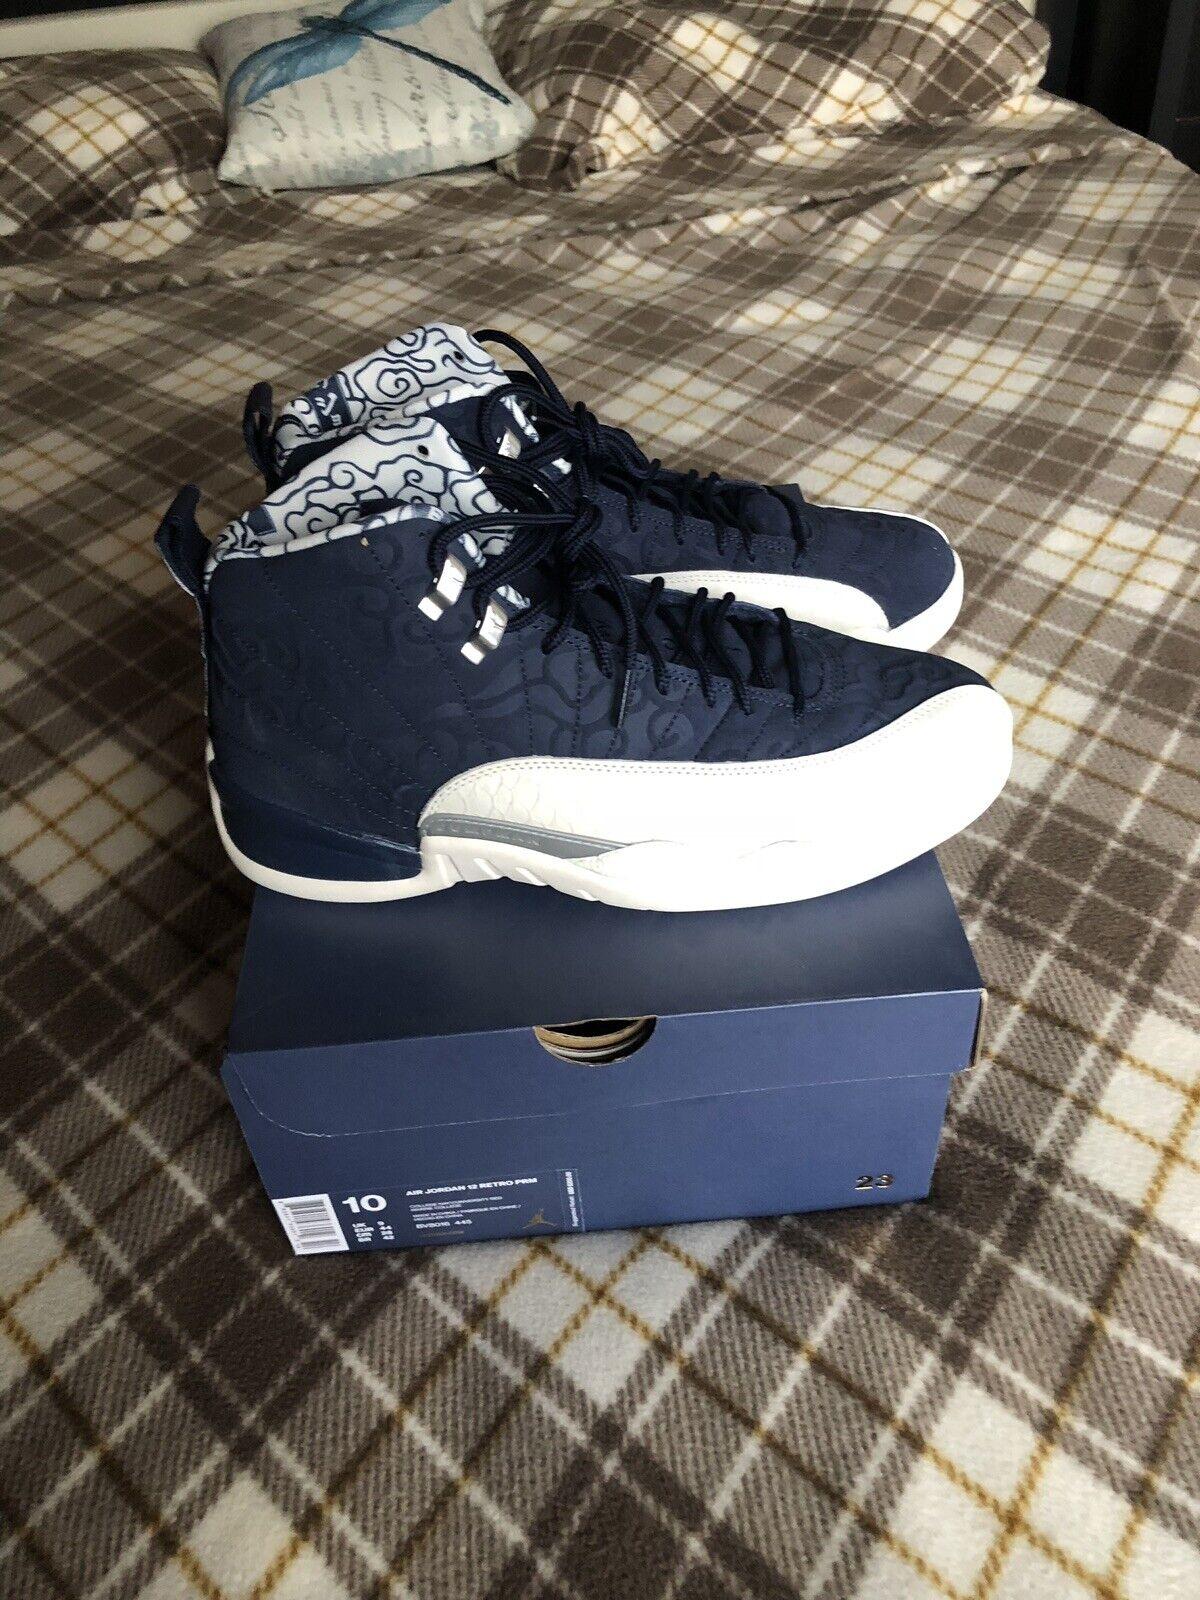 Air Jordan Retro 12 Mens Size 10 International Flight Navy  Authentic shoes